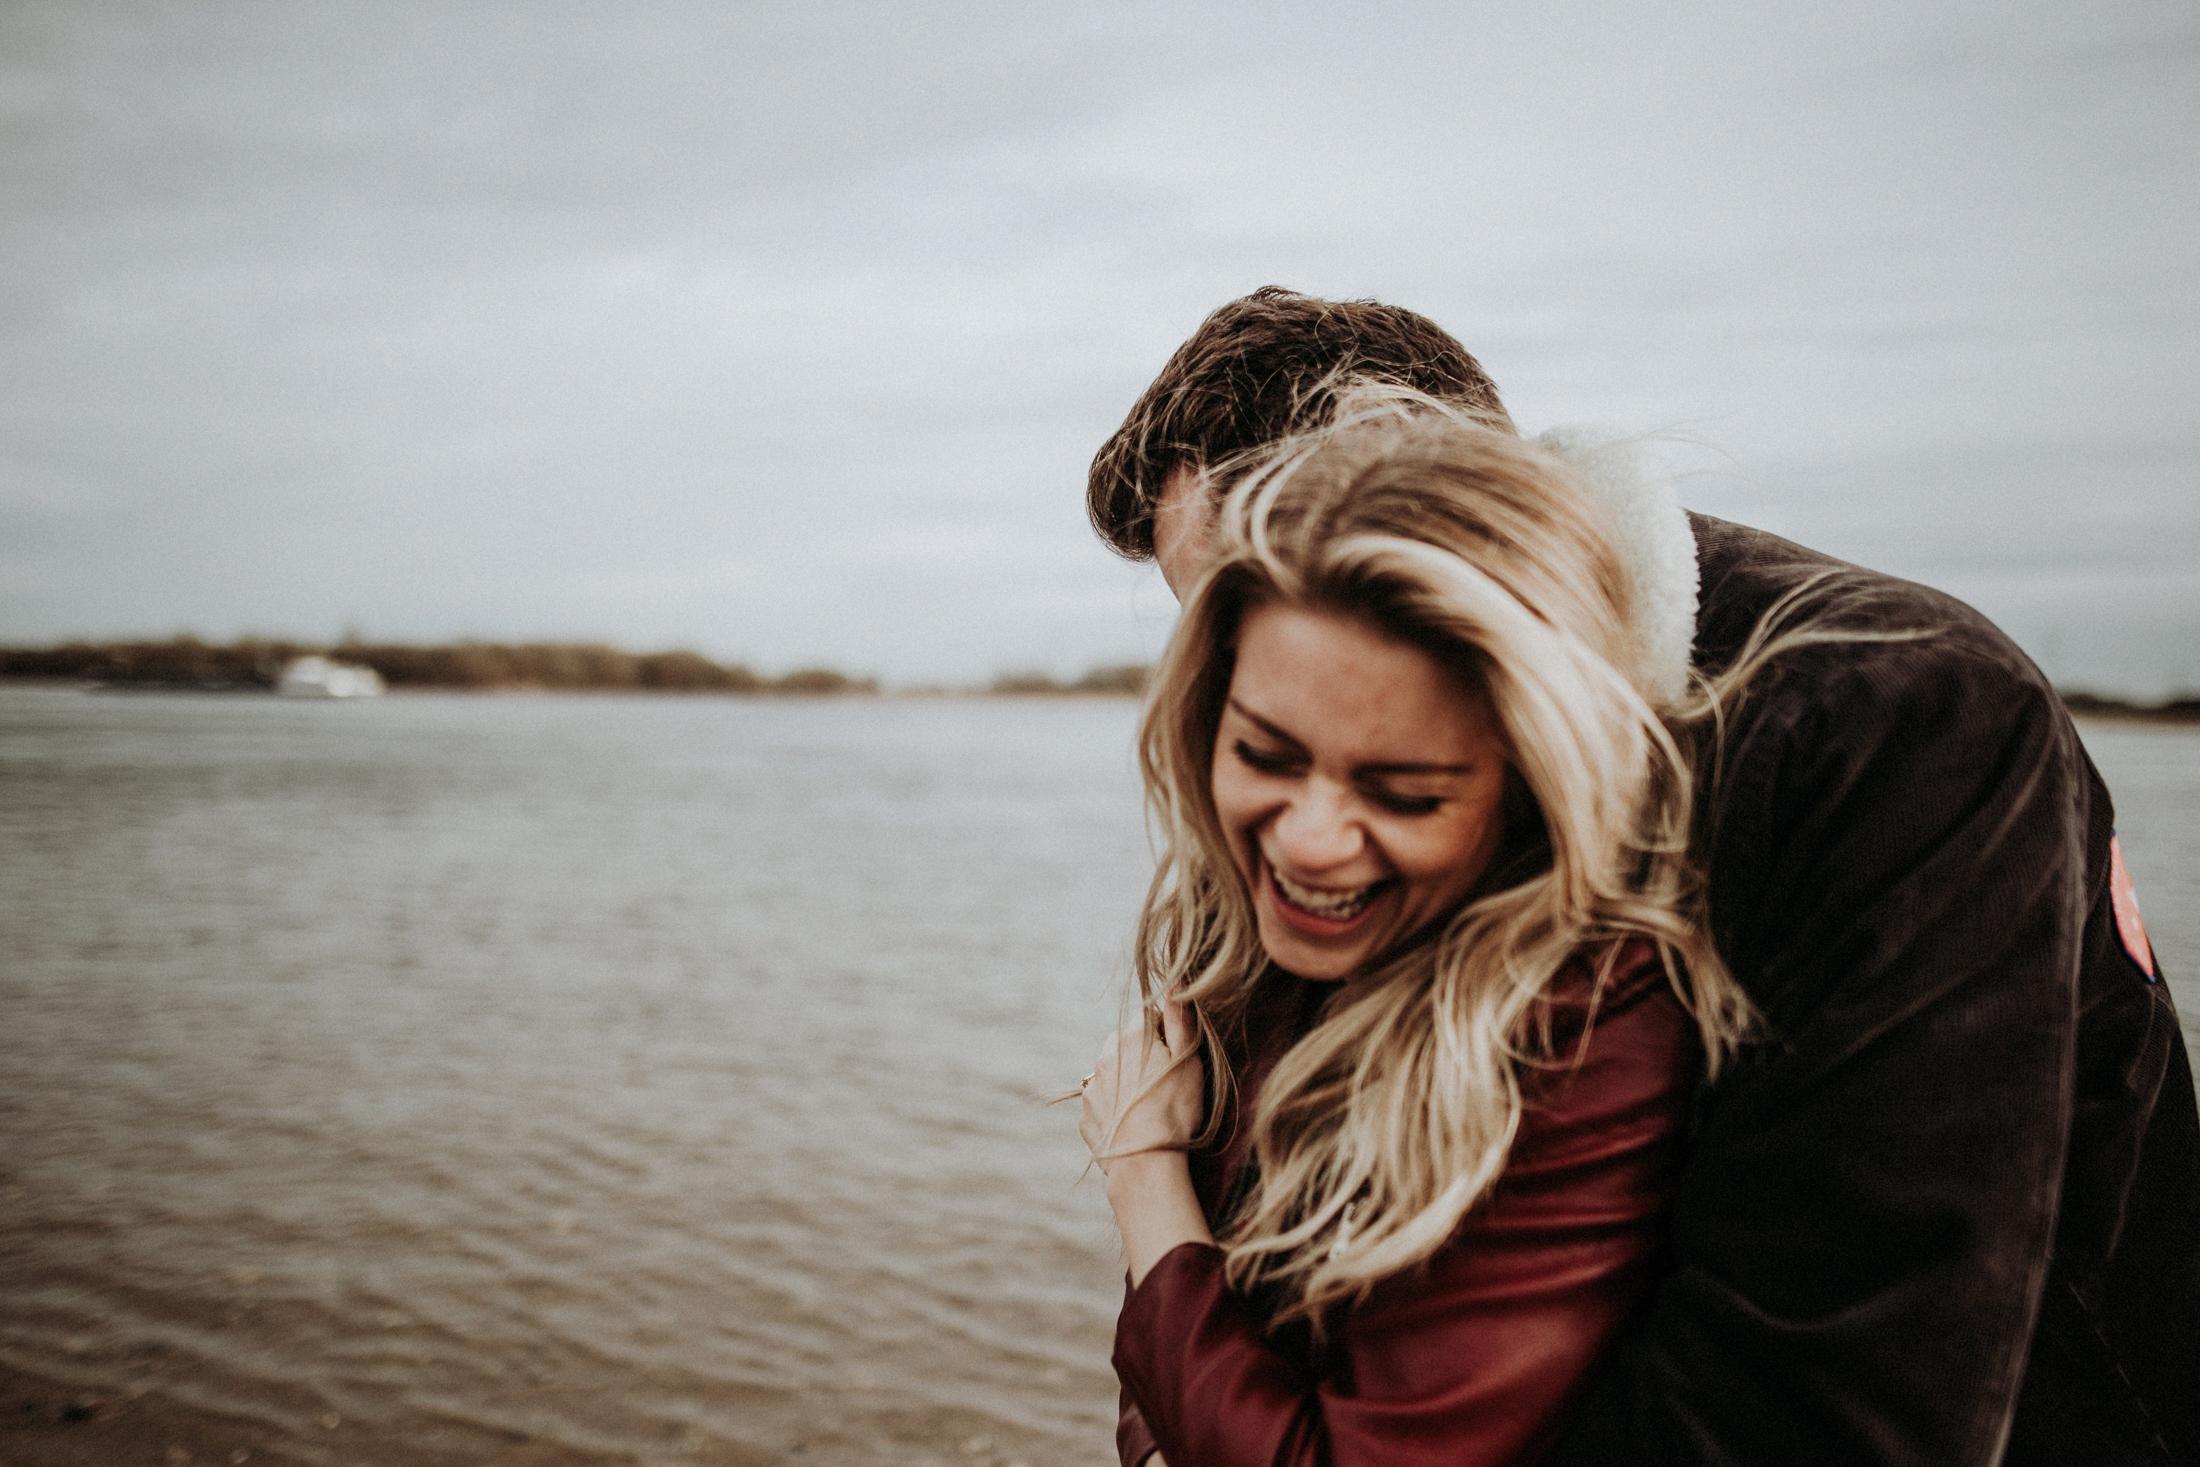 Wedding_Photographer_Mallorca_DanielaMarquardt_Photography_CanaryIslands_Lanzarote_Iceland_Tuscany_Santorini_Portugal_NewYork_Spain_Elopement_Hochzeitsfotograf_CK85